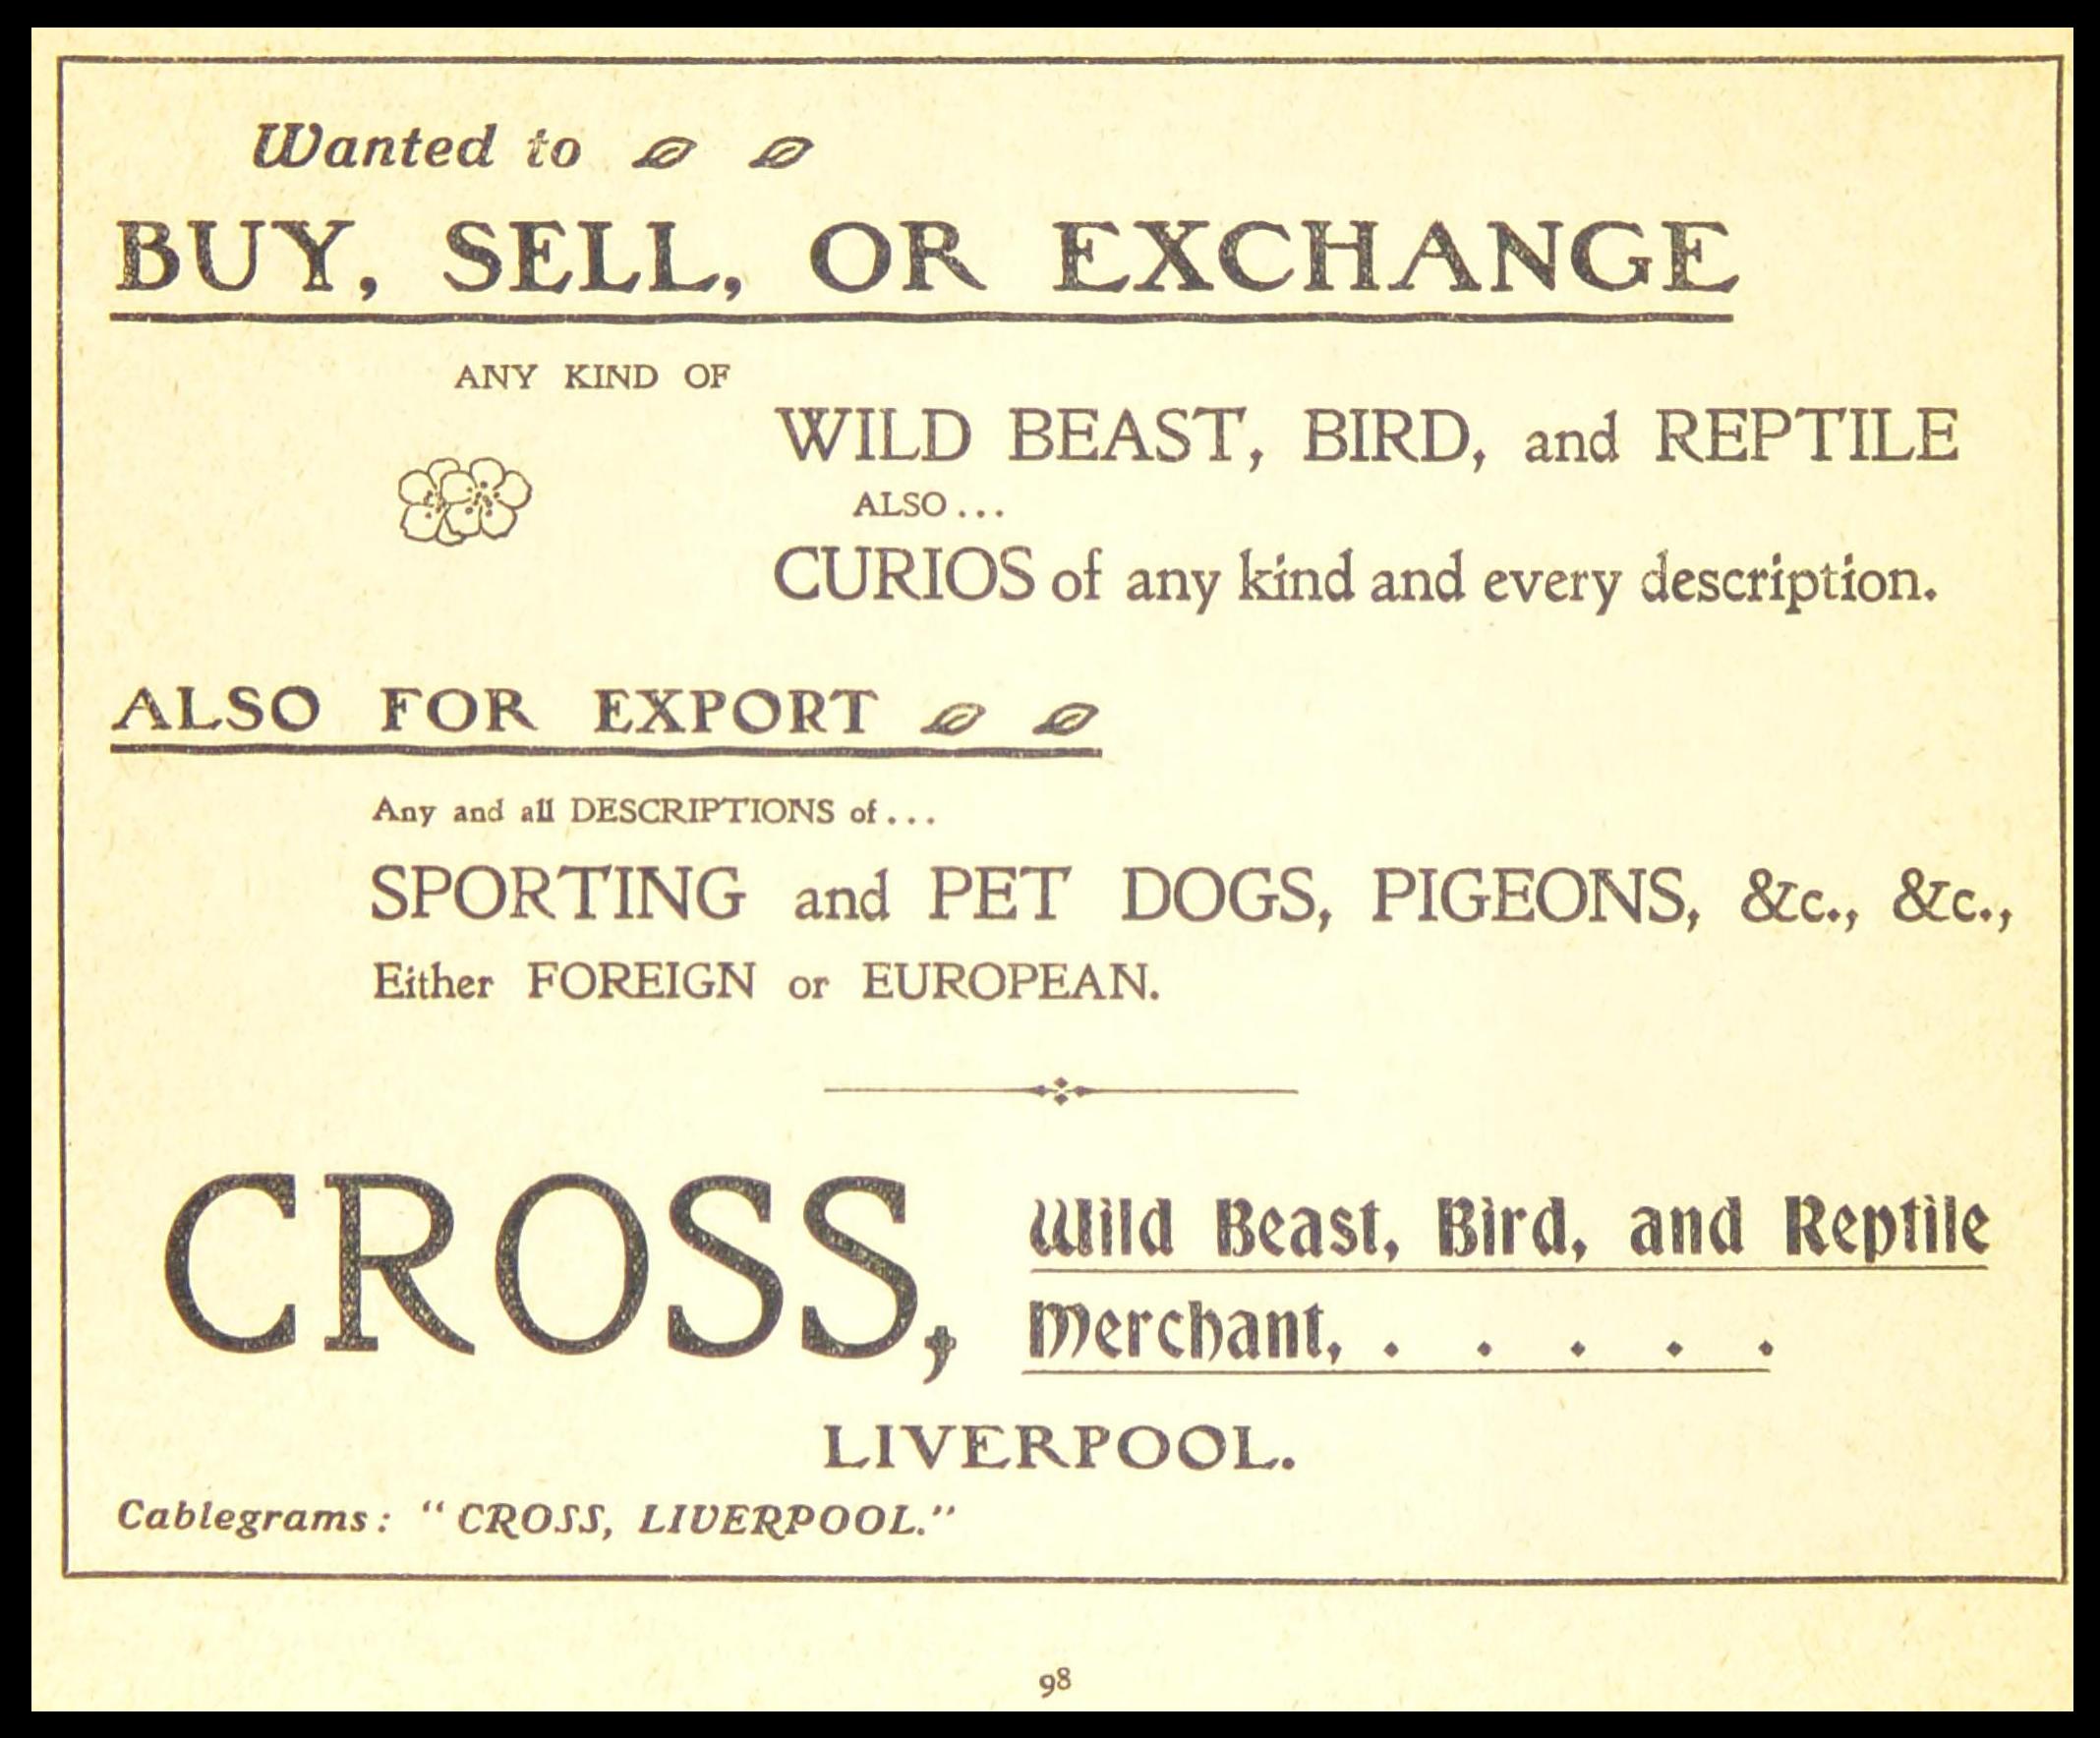 Cross, Wild Beast, Bird & Reptile Merchant Advertisement 1906.png